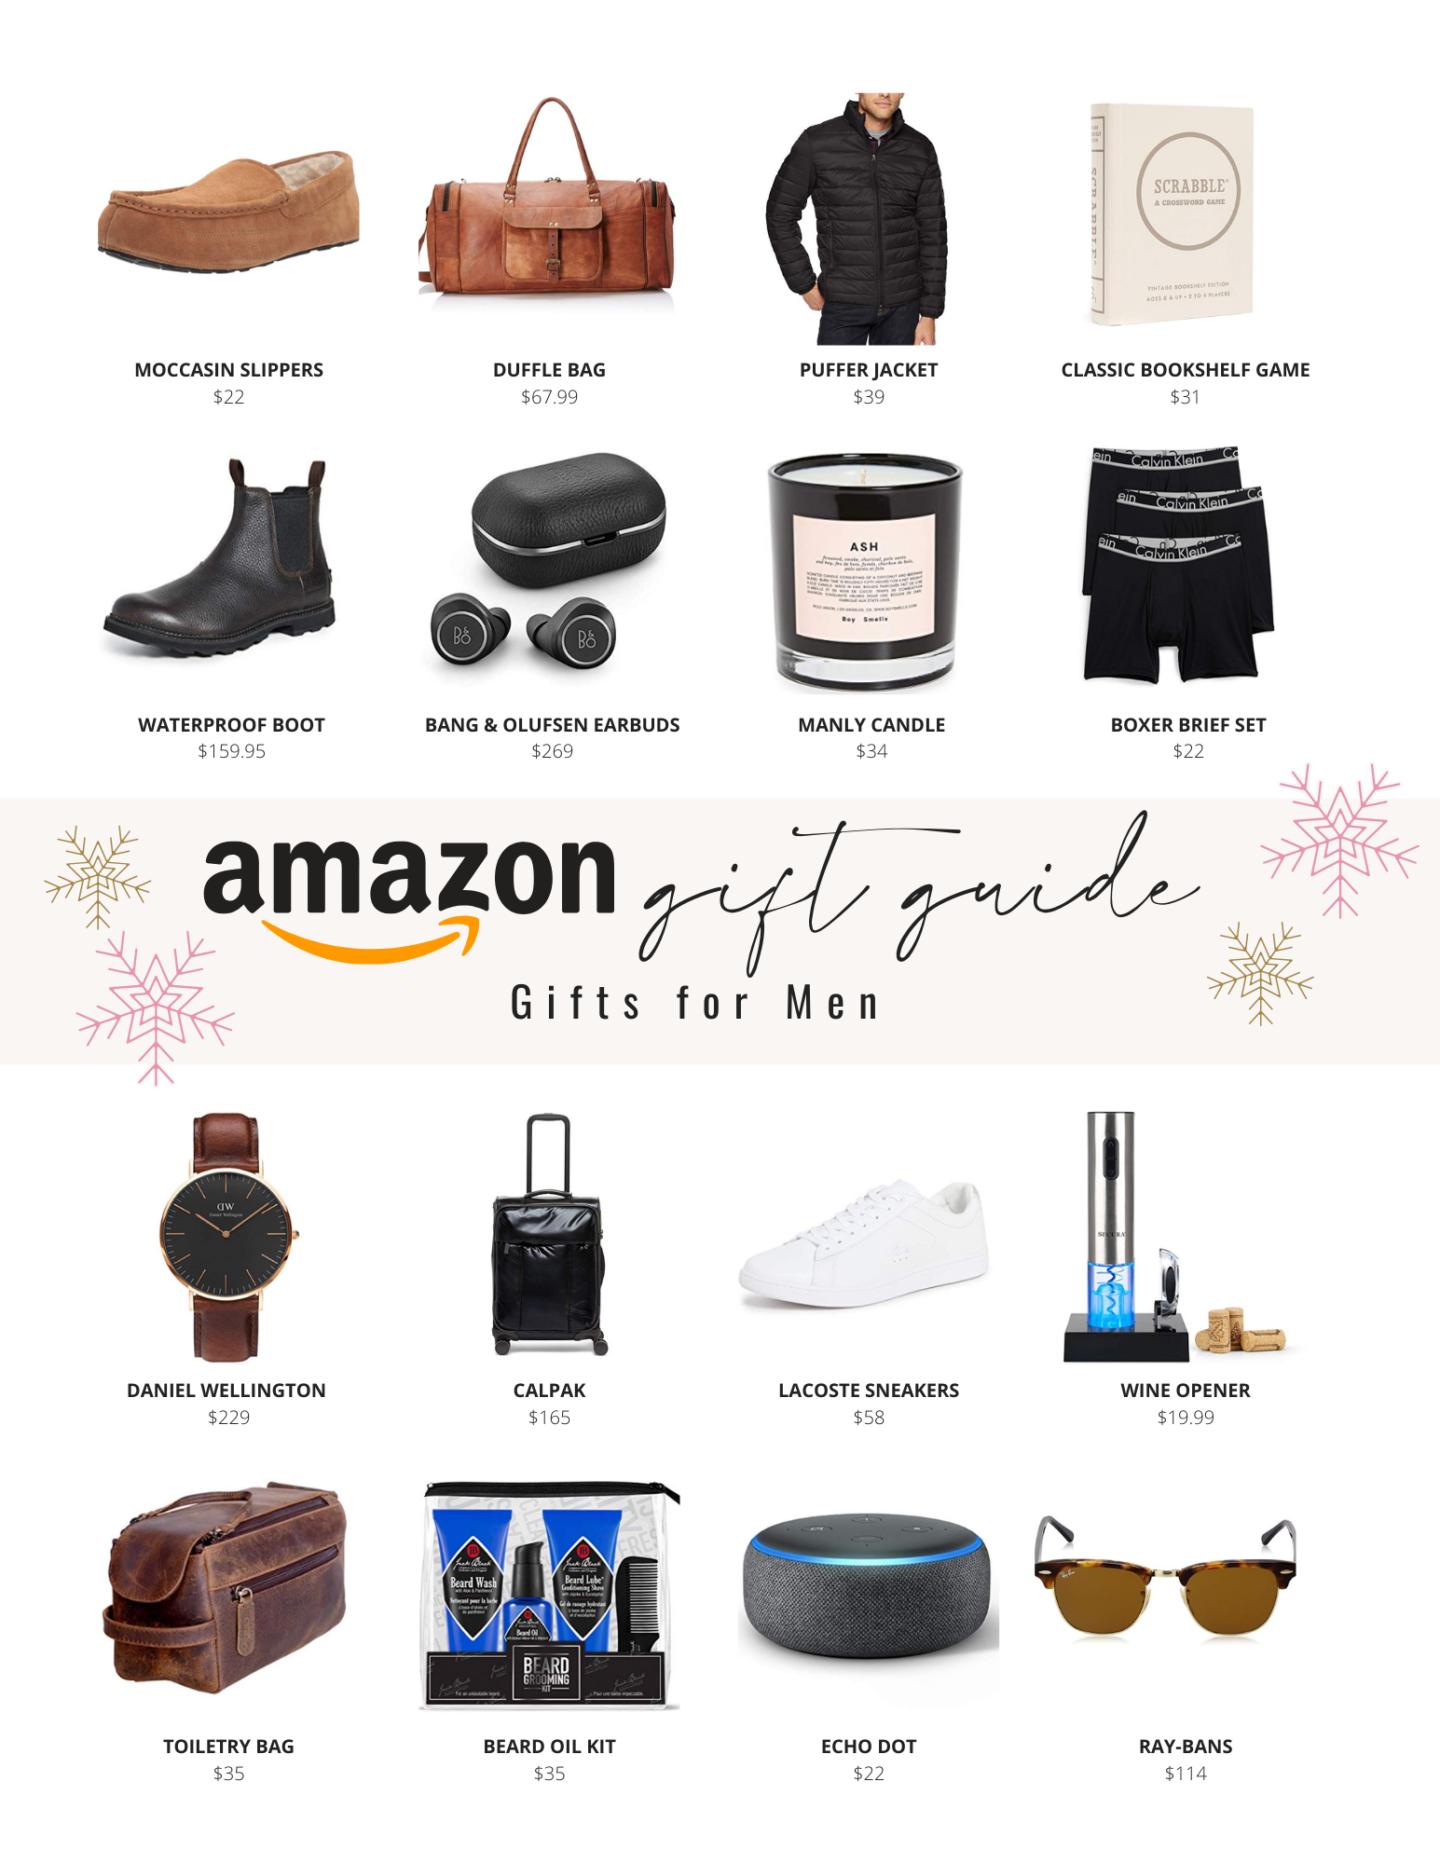 The Ultimate Amazon Gift Guide Amazon Gift Ideas For Men Best Amazon Gifts Amazon Gifts Mens Gift Guide